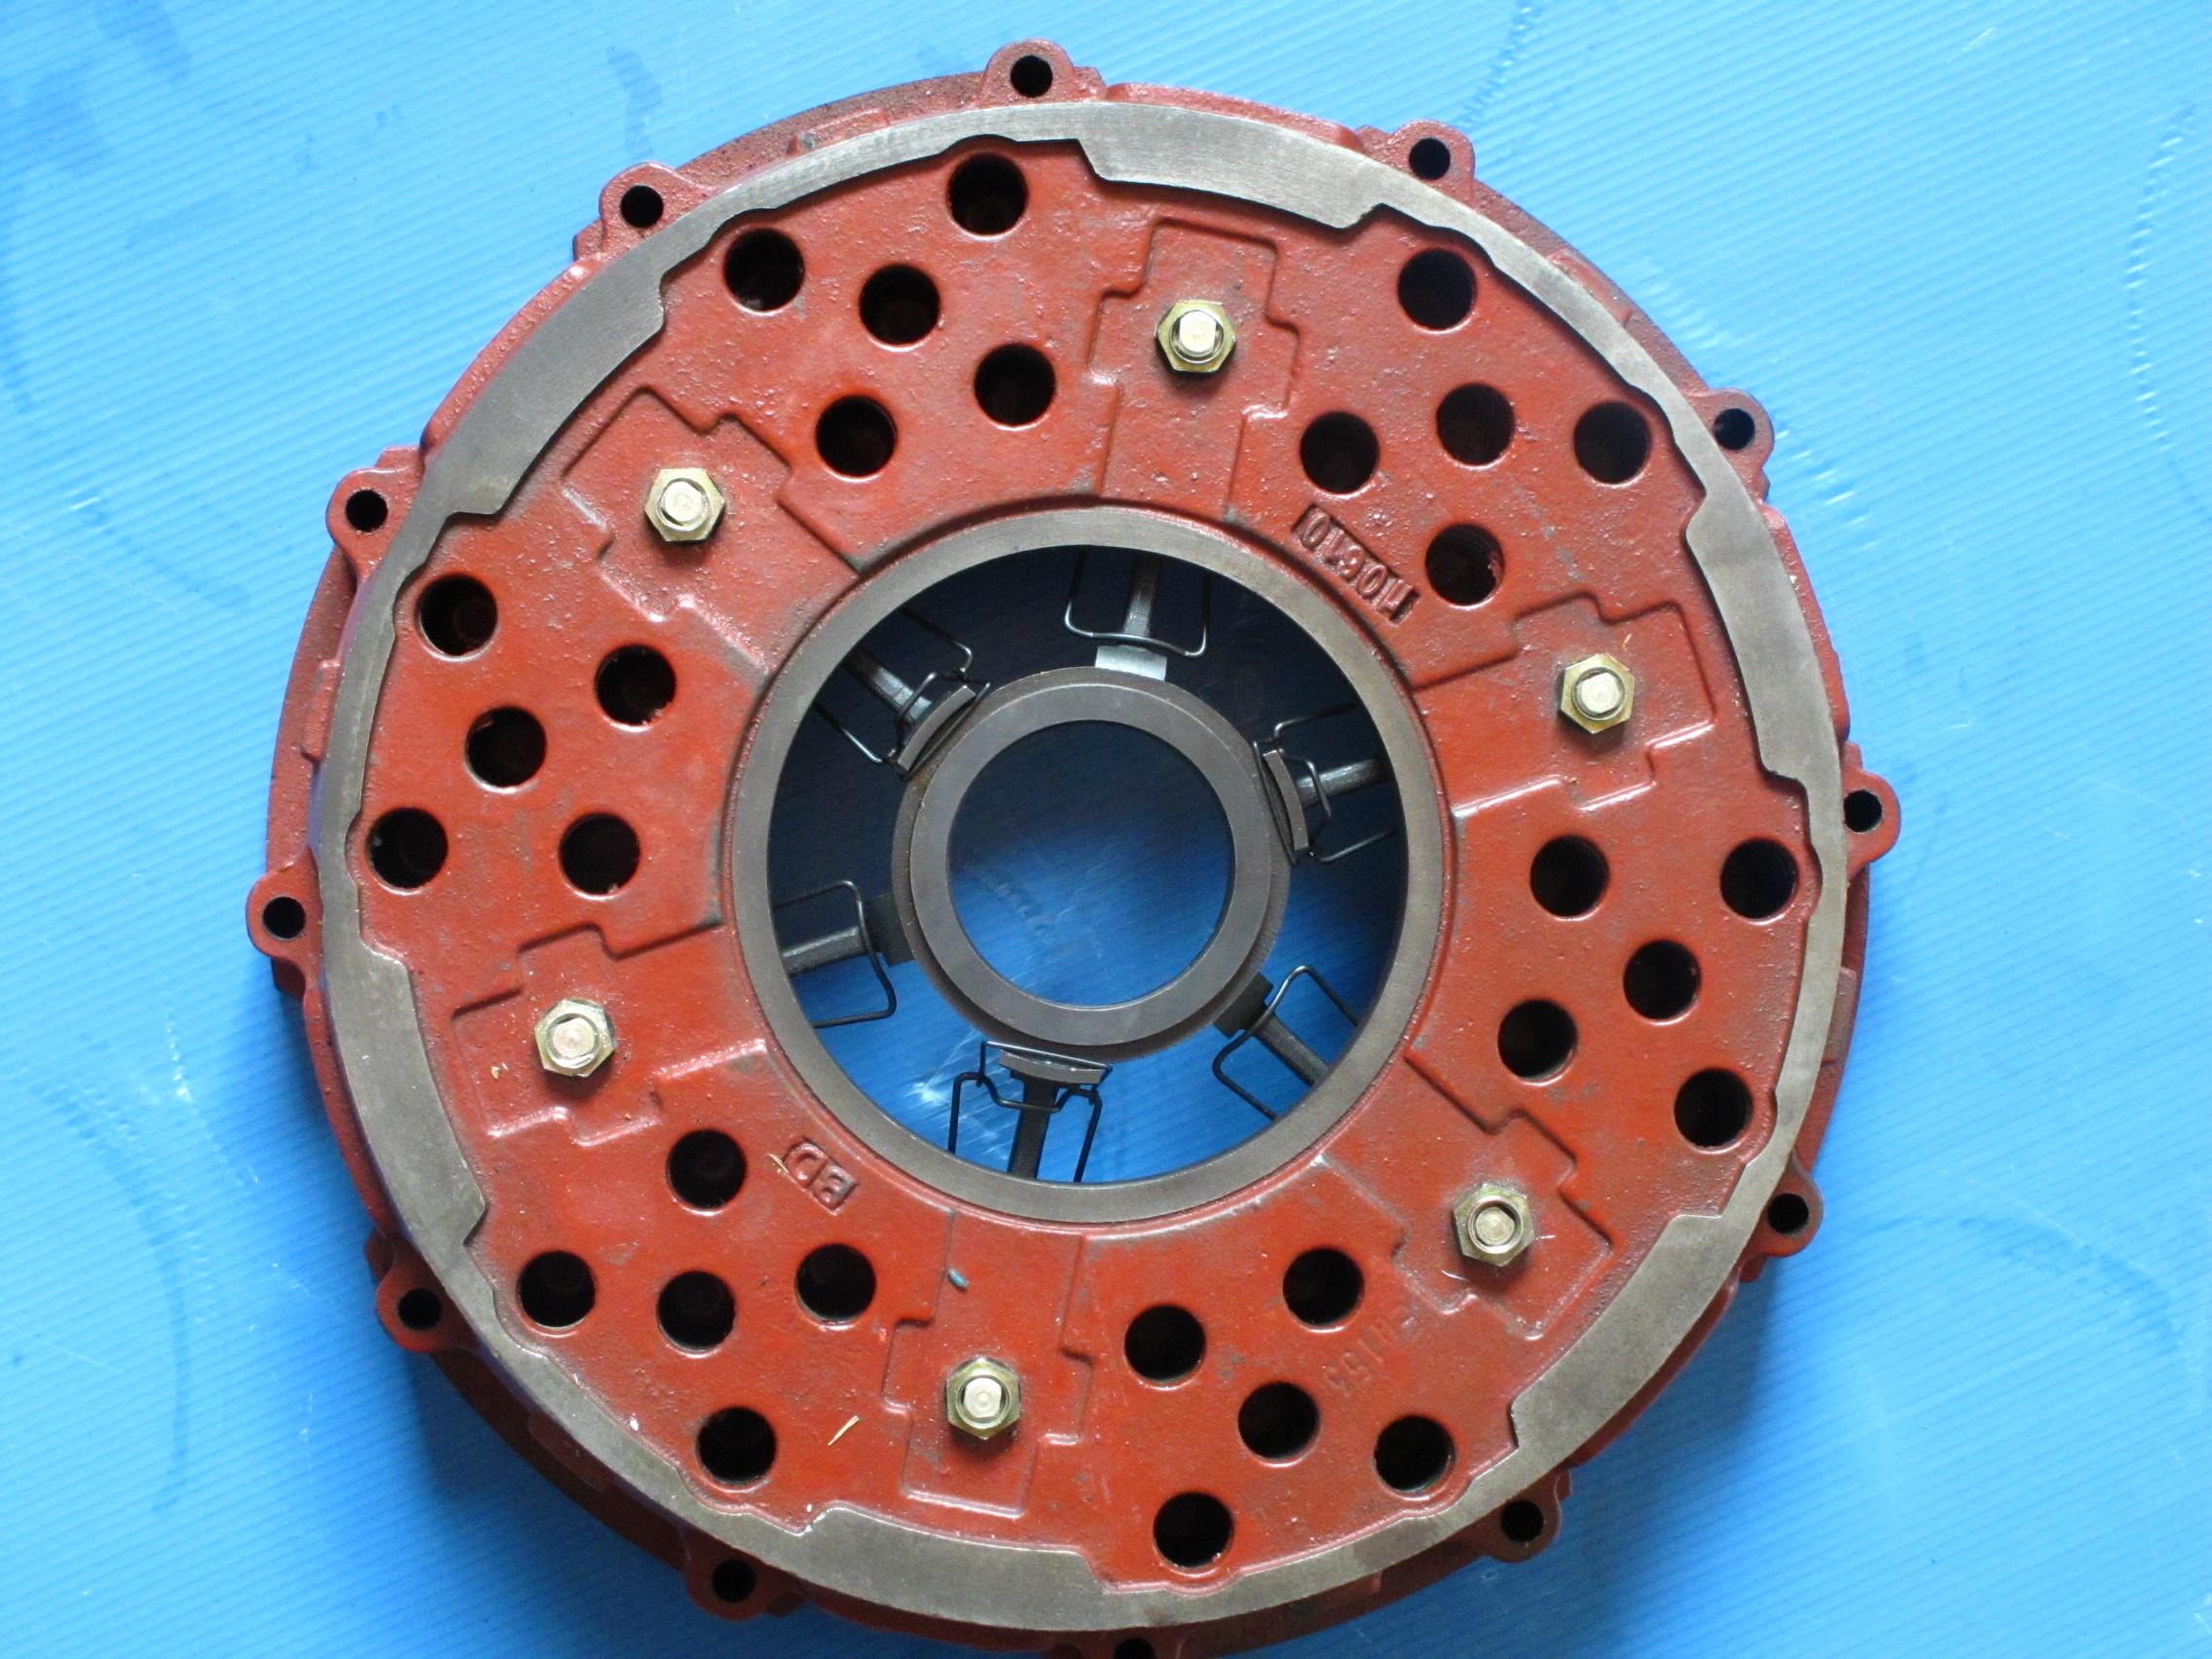 Clutch Disc for HON 150,160E 16V 1992- 3020VL905B 1020V1510B NSK47TKB3102A